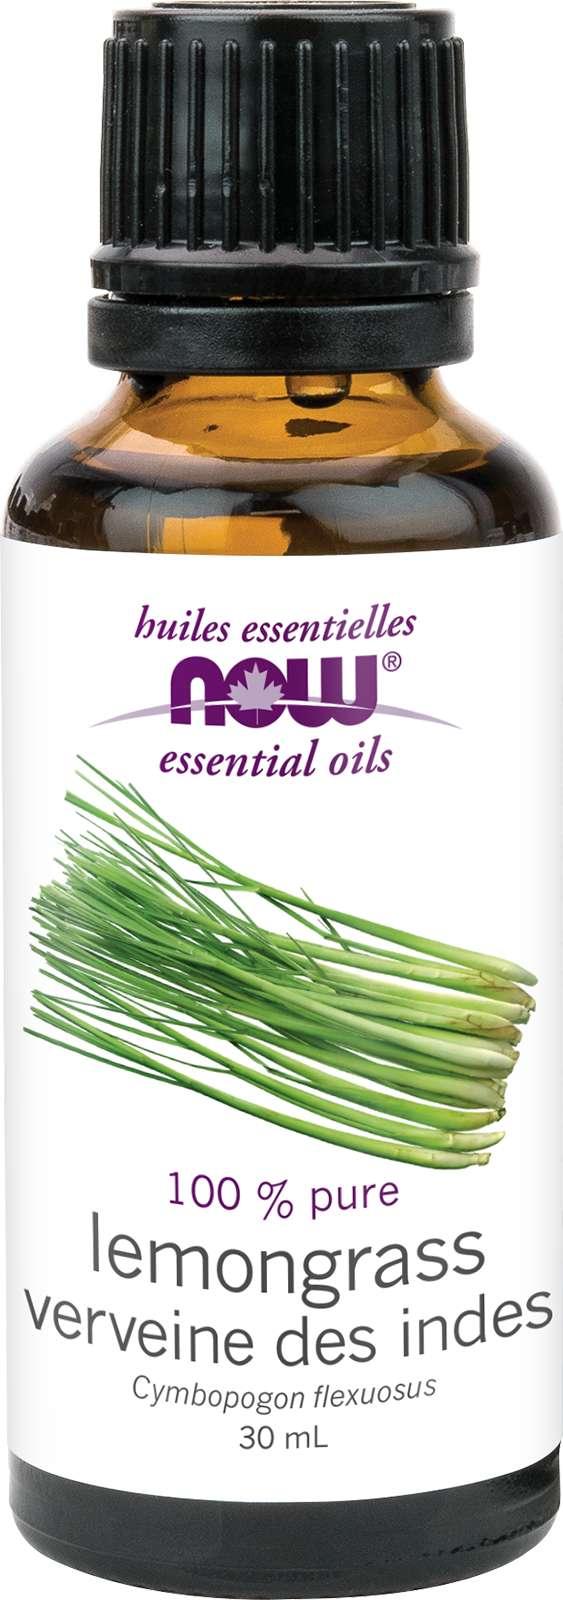 Lemongrass Oil (Cymbopogon flexuosus) 30mL